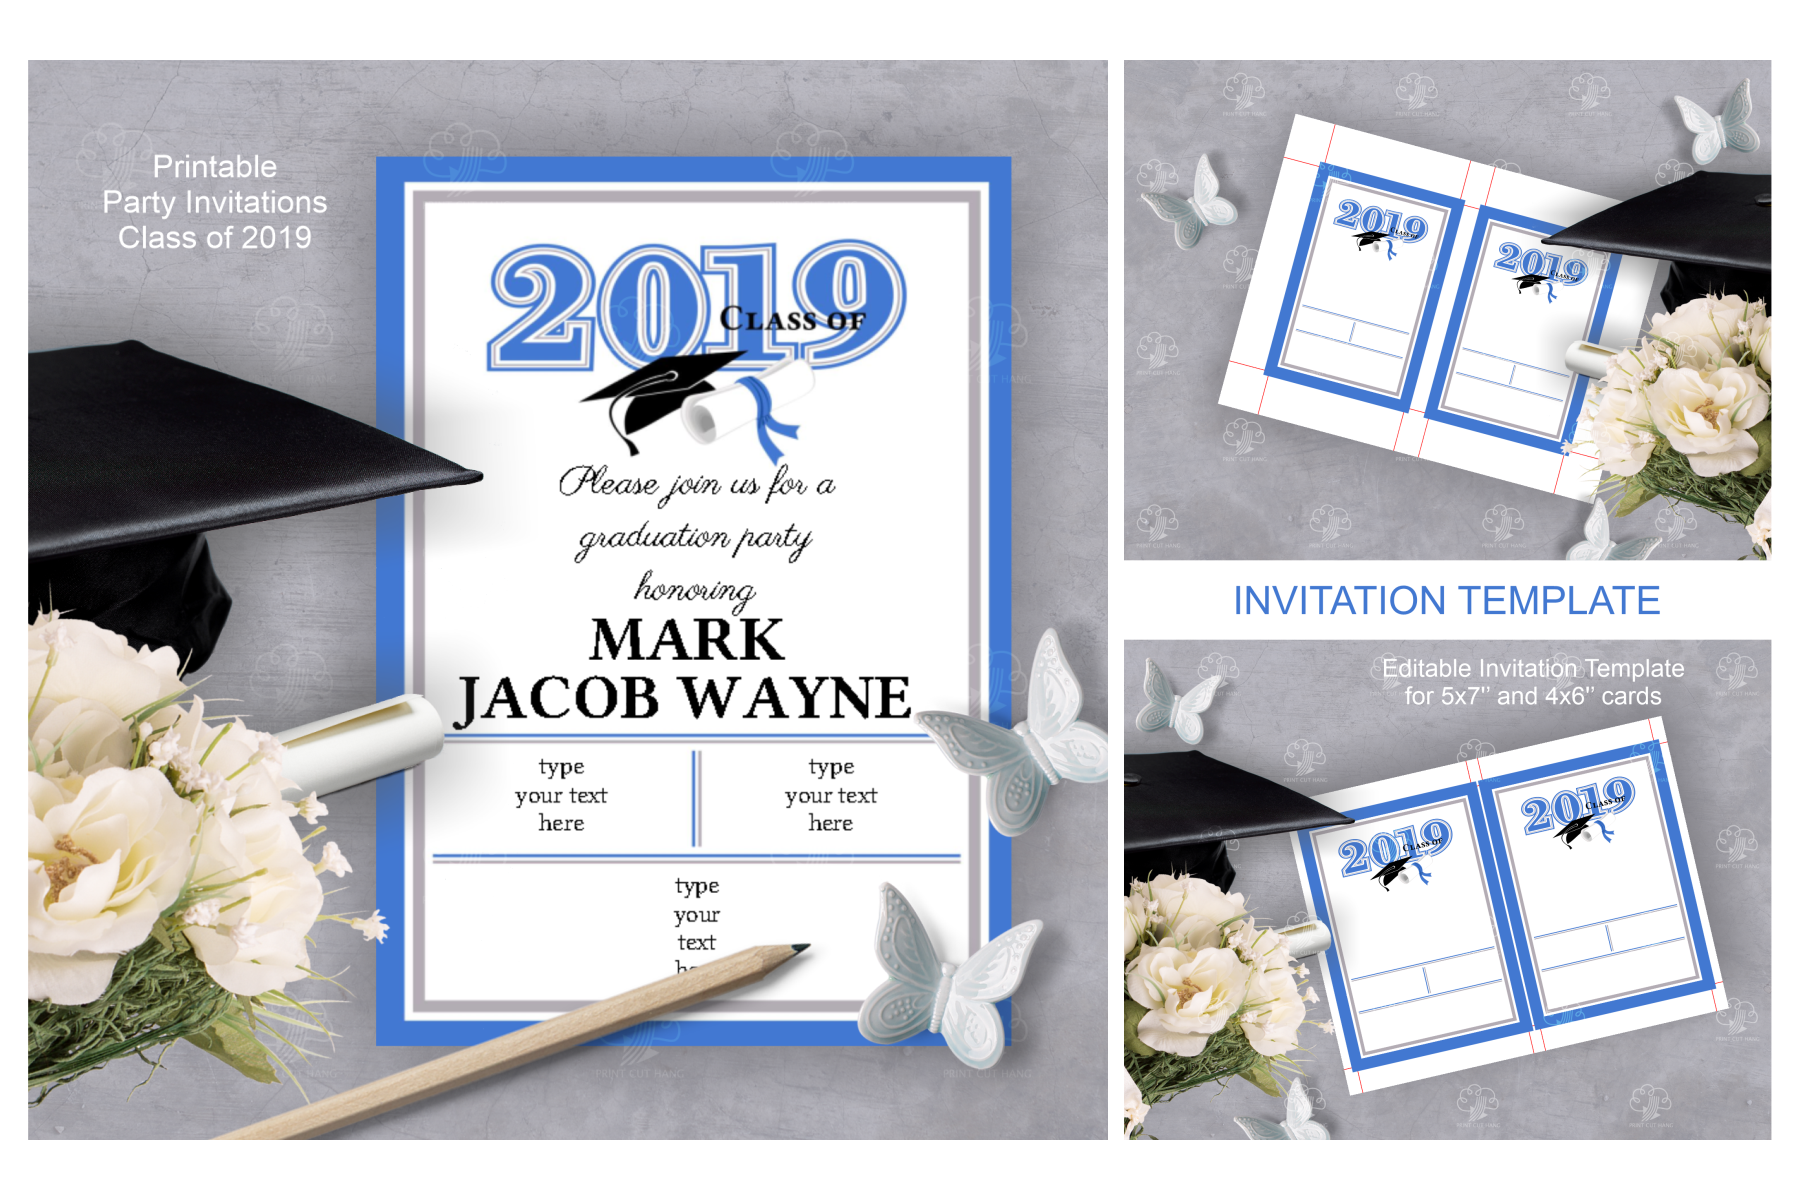 Invitation Template editable text - BLUE - Graduation 2019 example image 2